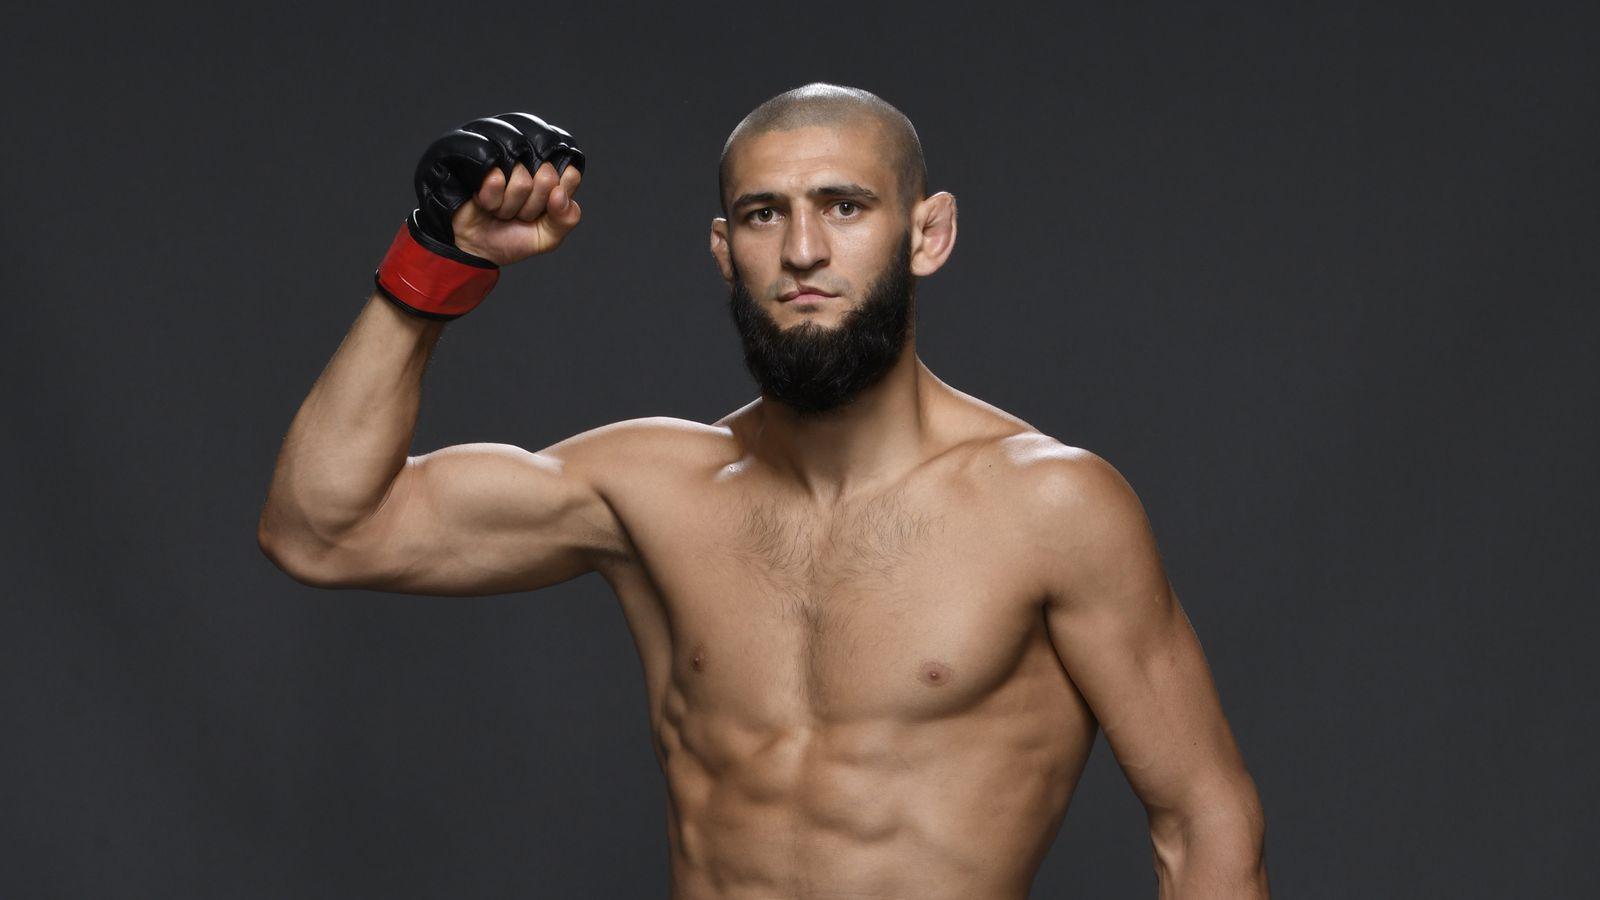 Luke Rockhold says Khamzat Chimaev declined fight